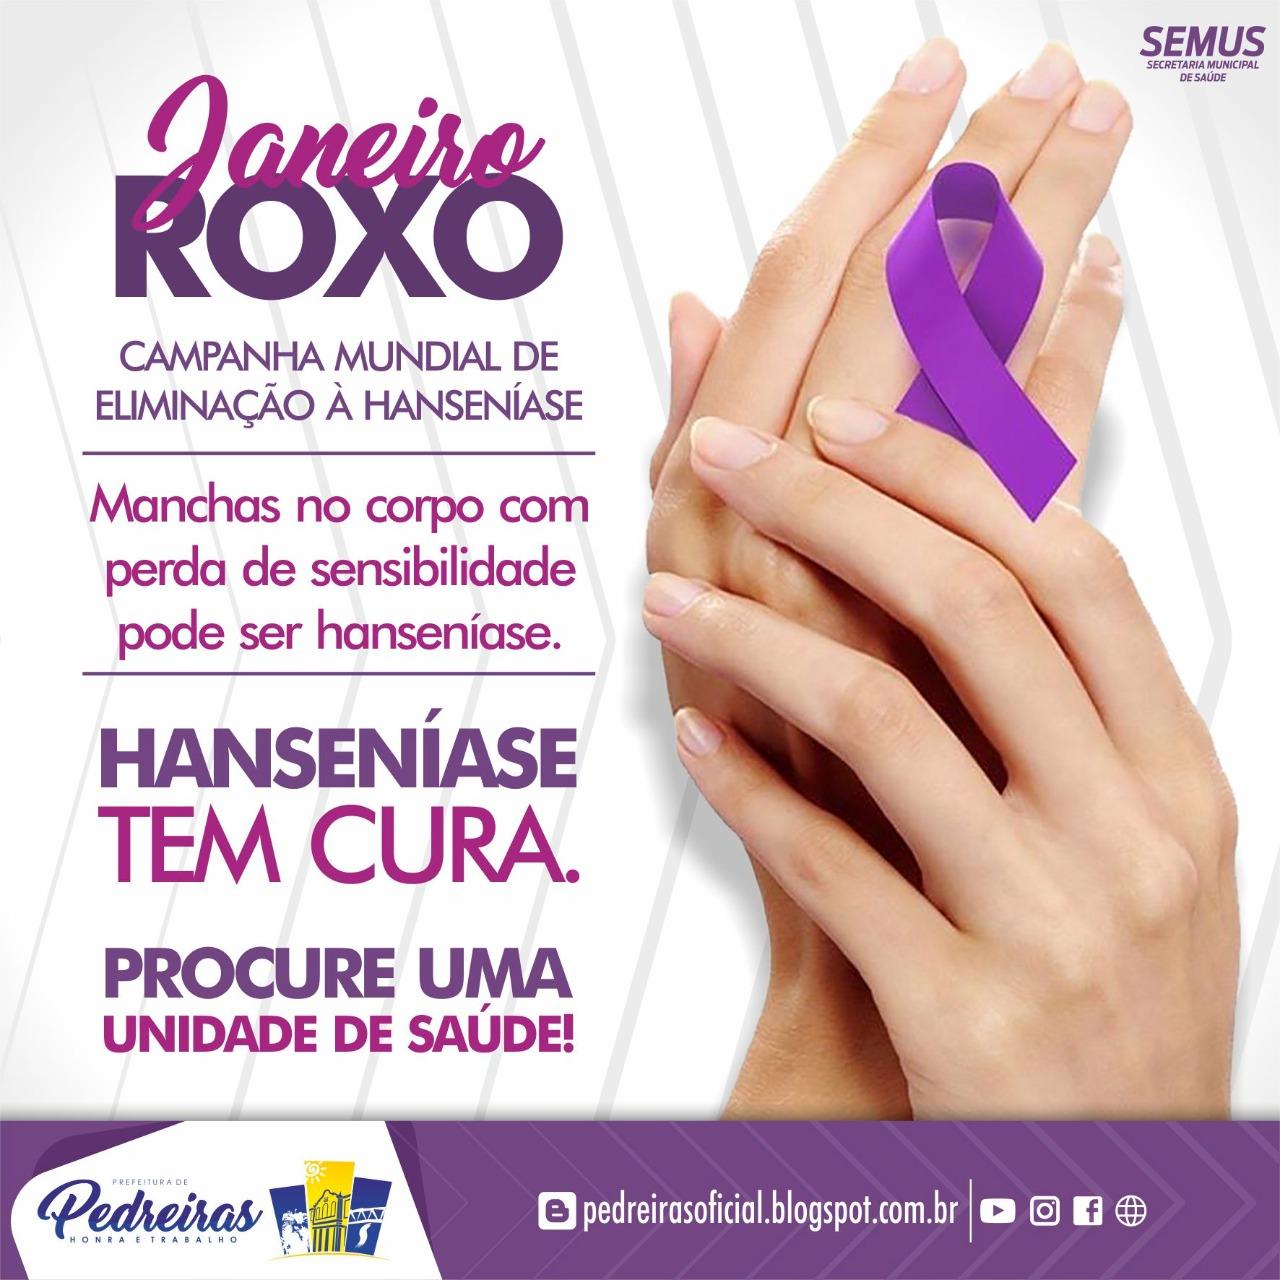 JANEIRO ROXO